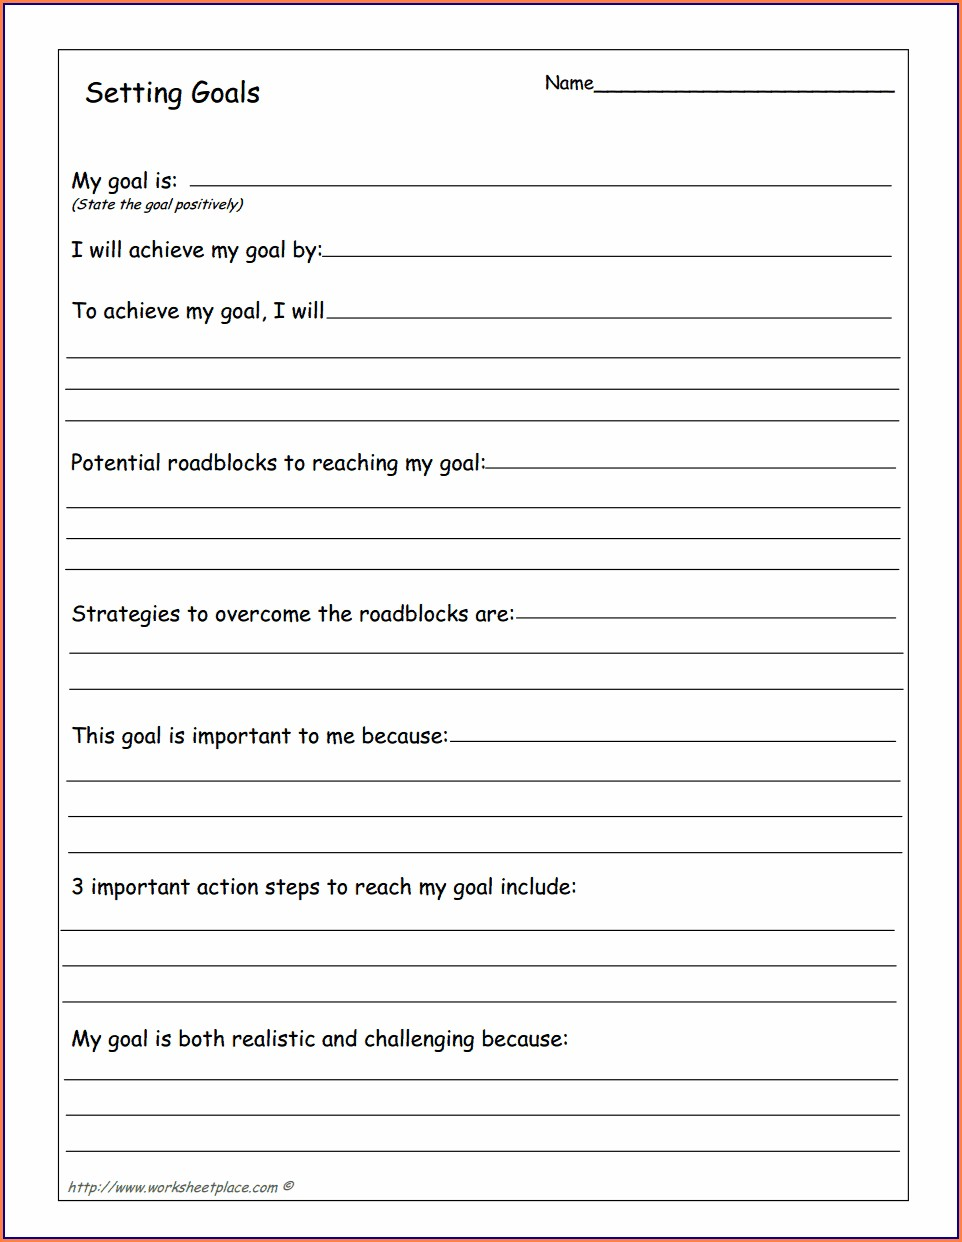 Printable Goal Setting Worksheet For High School Students Pdf